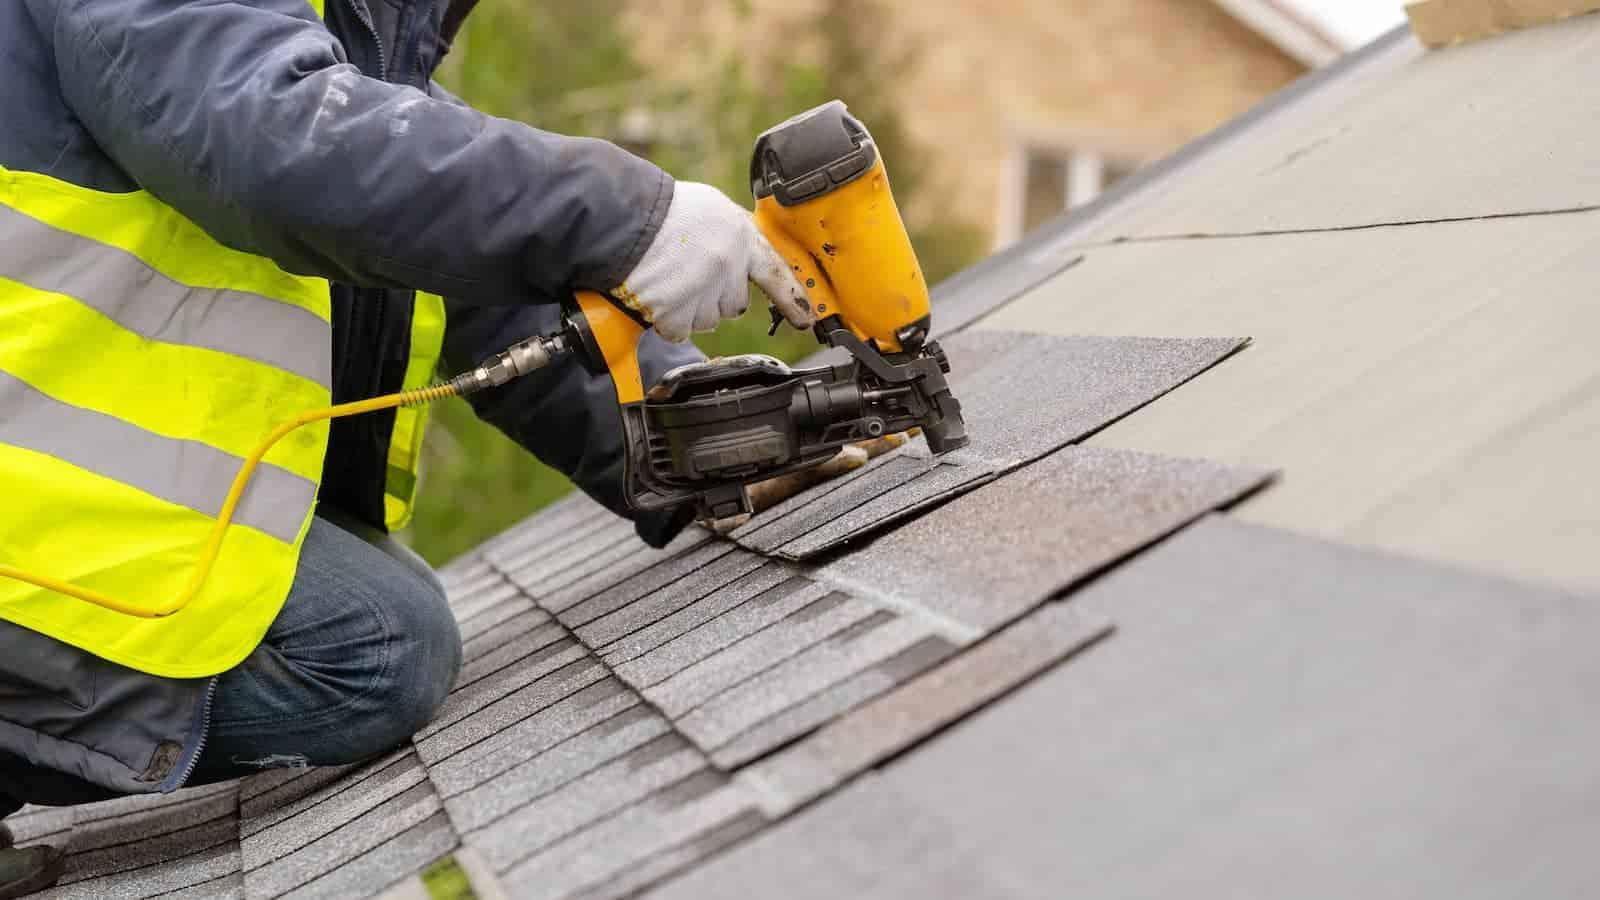 Roofer Doing Roof Repair